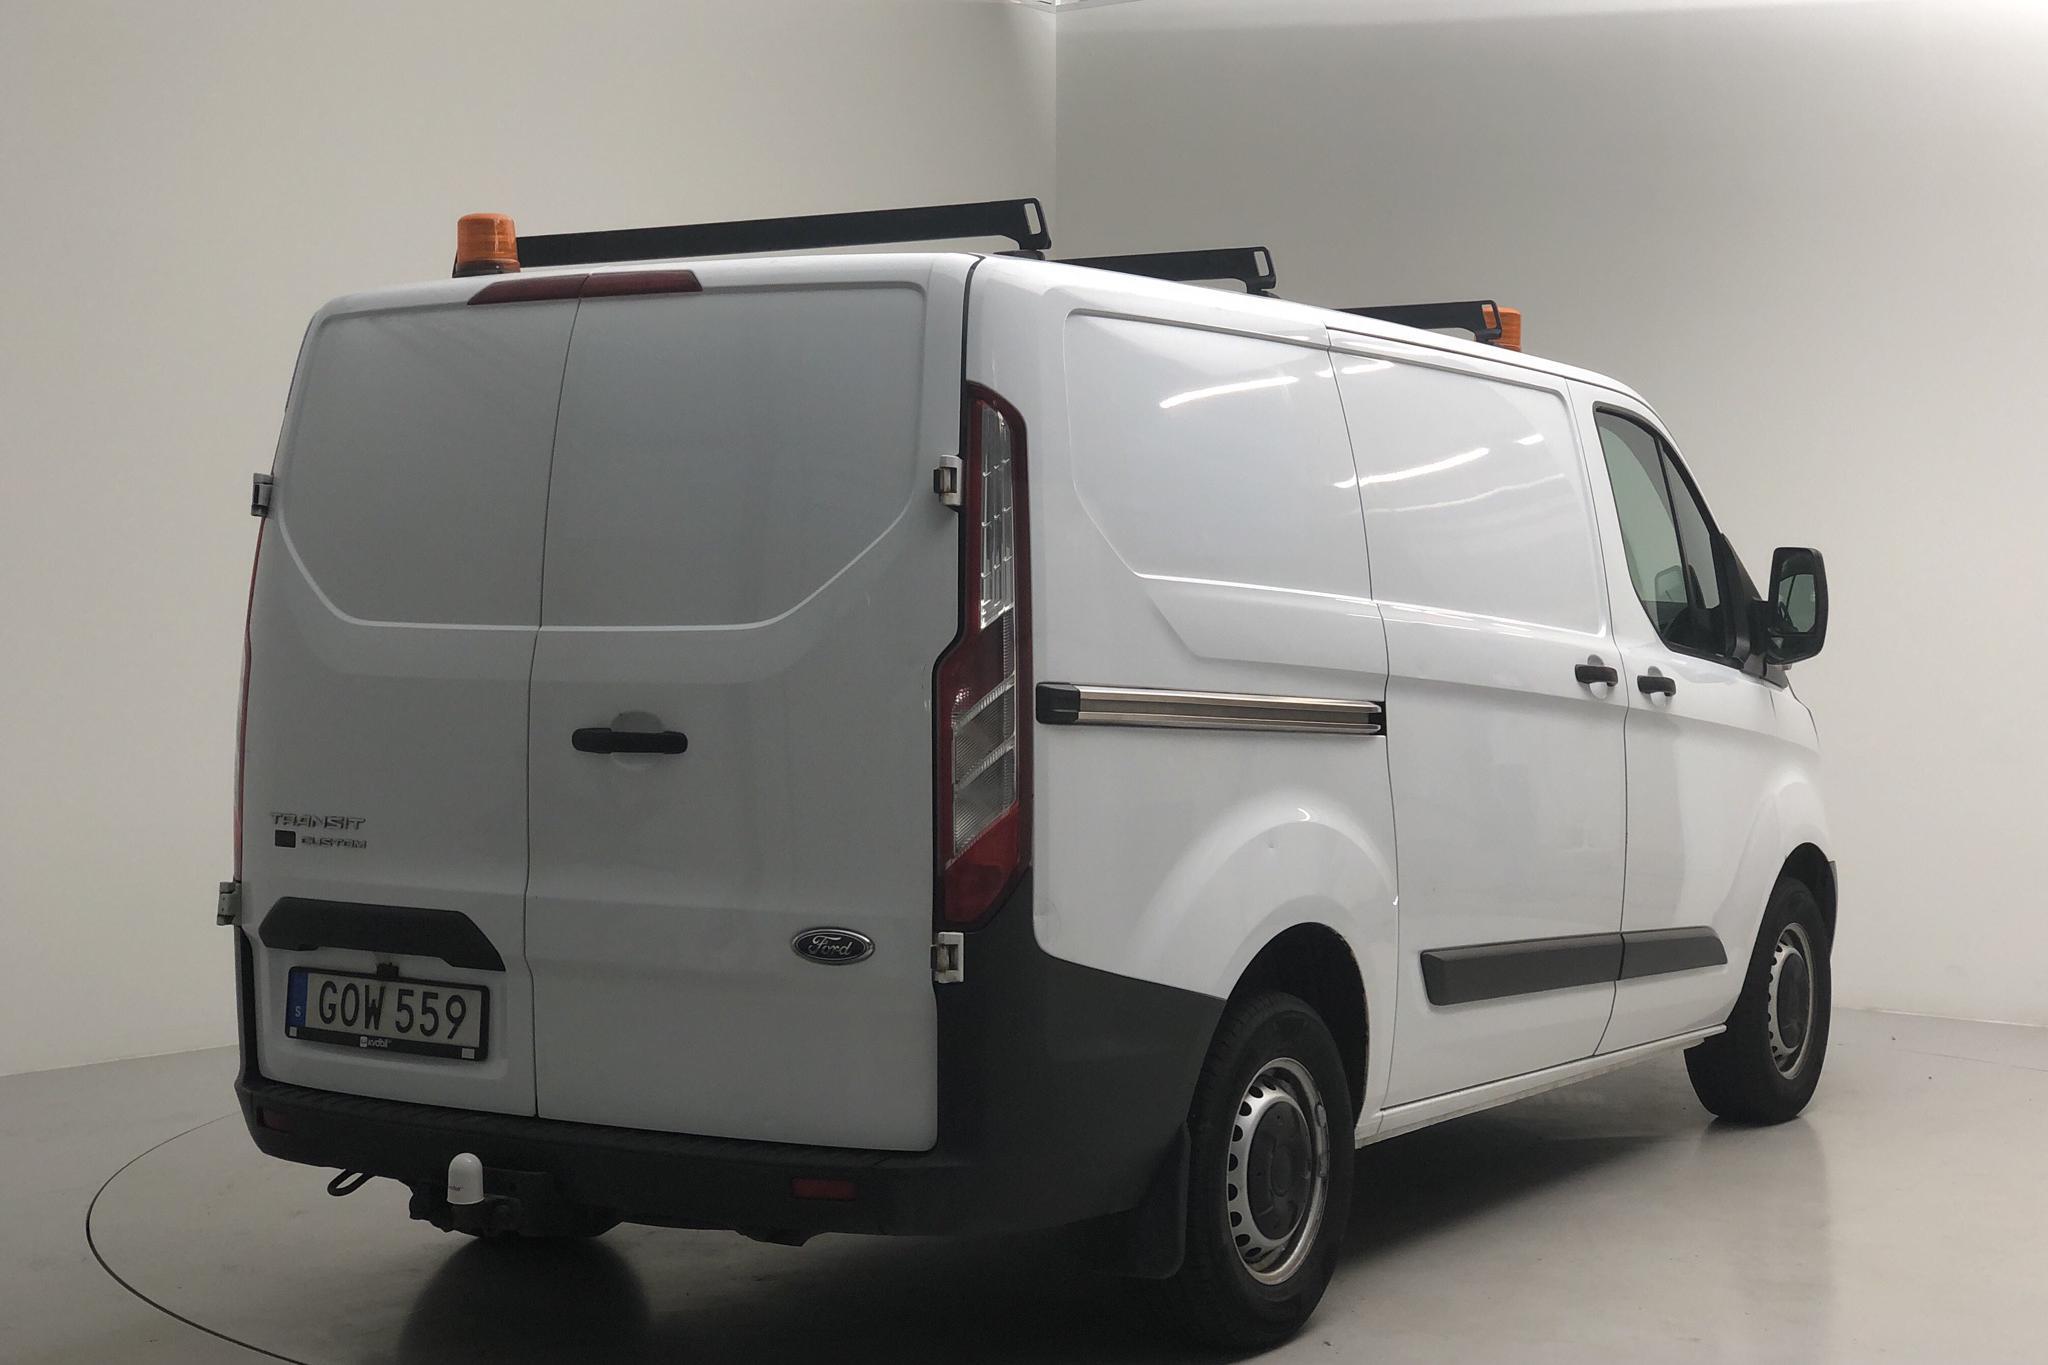 Ford Transit Custom 270 (100hk) - 11 003 mil - Manuell - vit - 2015